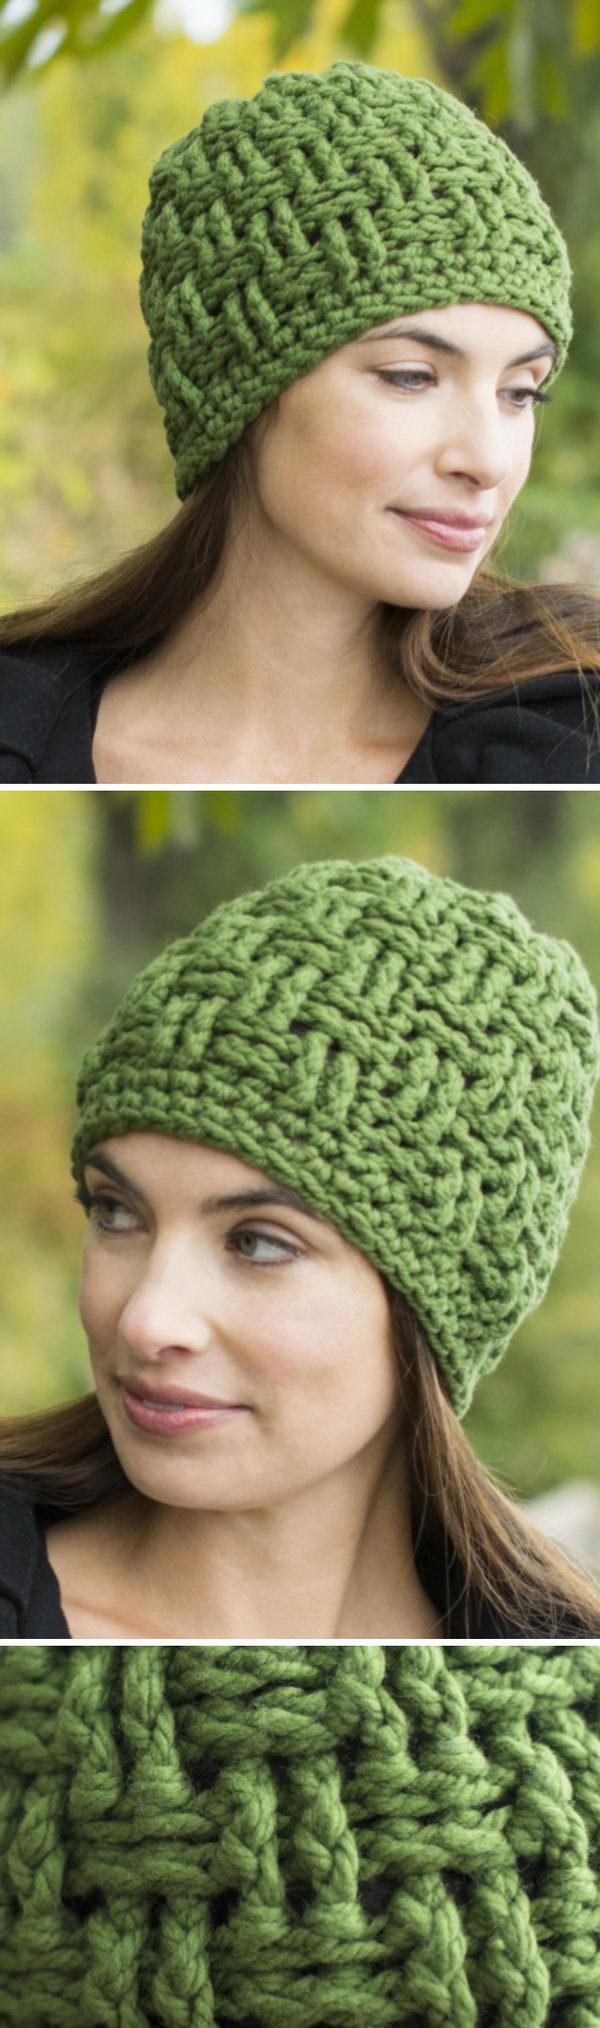 Boliviana Bulky Basketweave Hat.